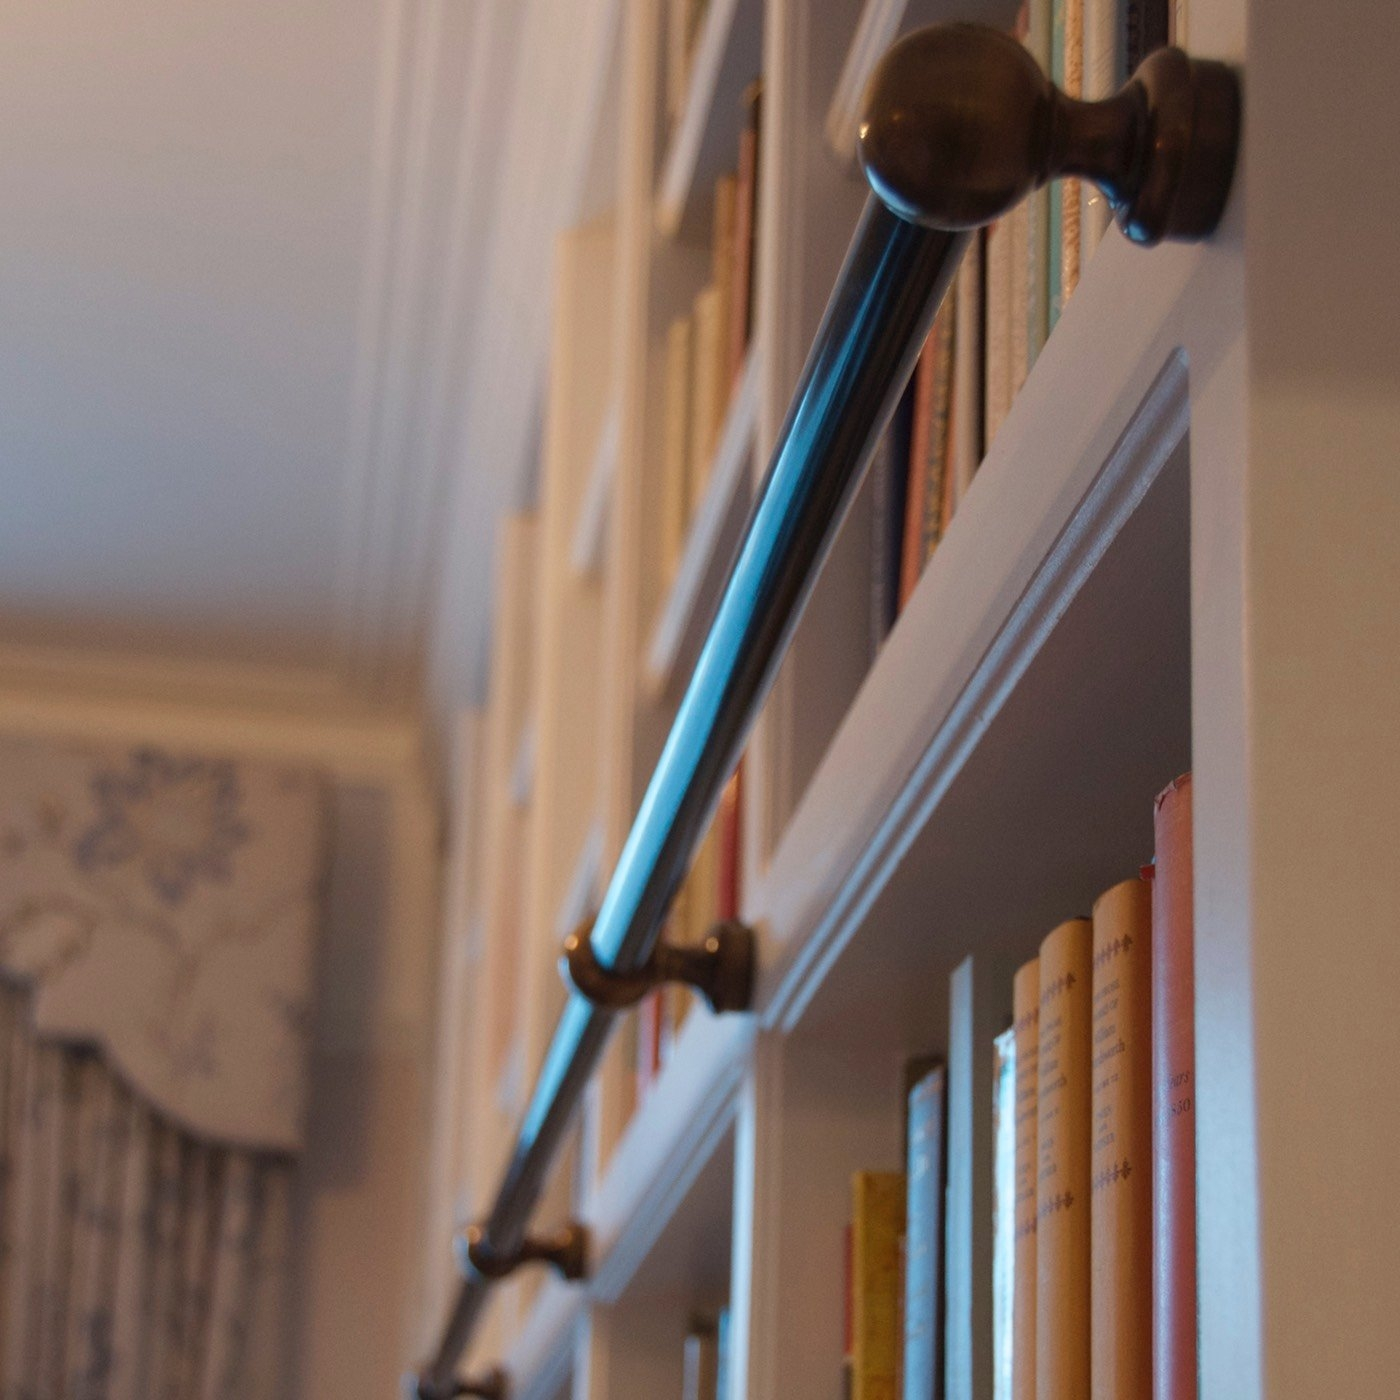 Amazing Wooden Library Ladders Uk 2 Bespoke Bronze Hook On Inside Wooden Library Ladders (#1 of 15)